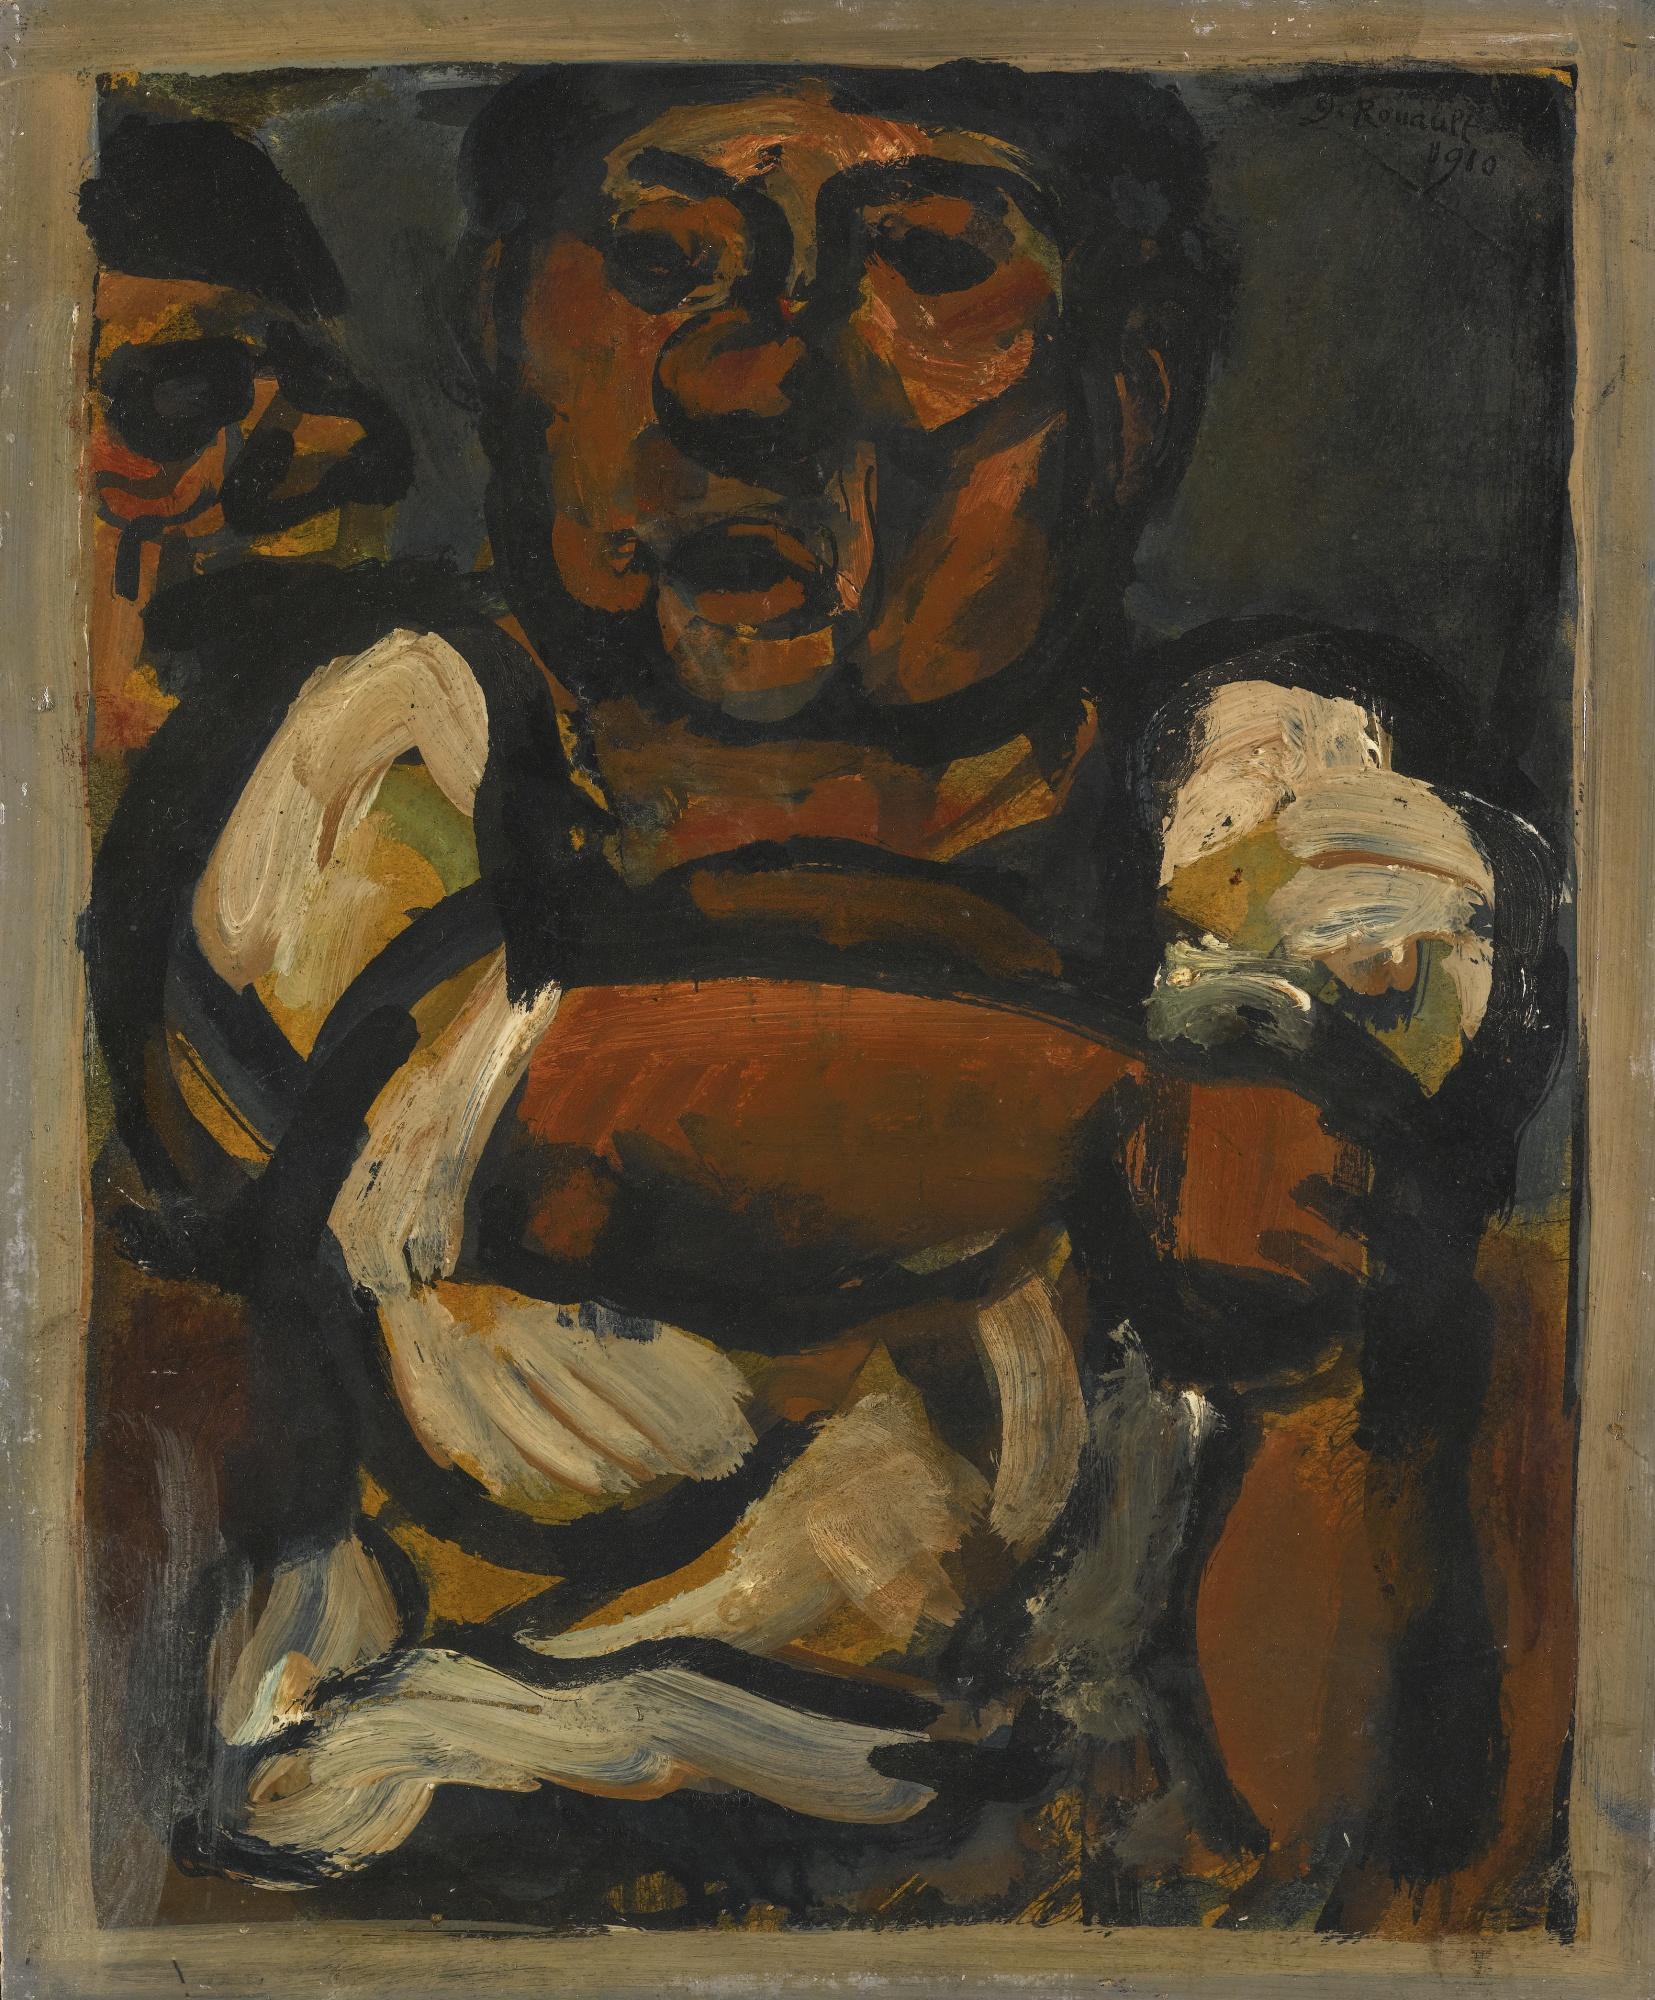 Georges Rouault-FierA Bras-1910